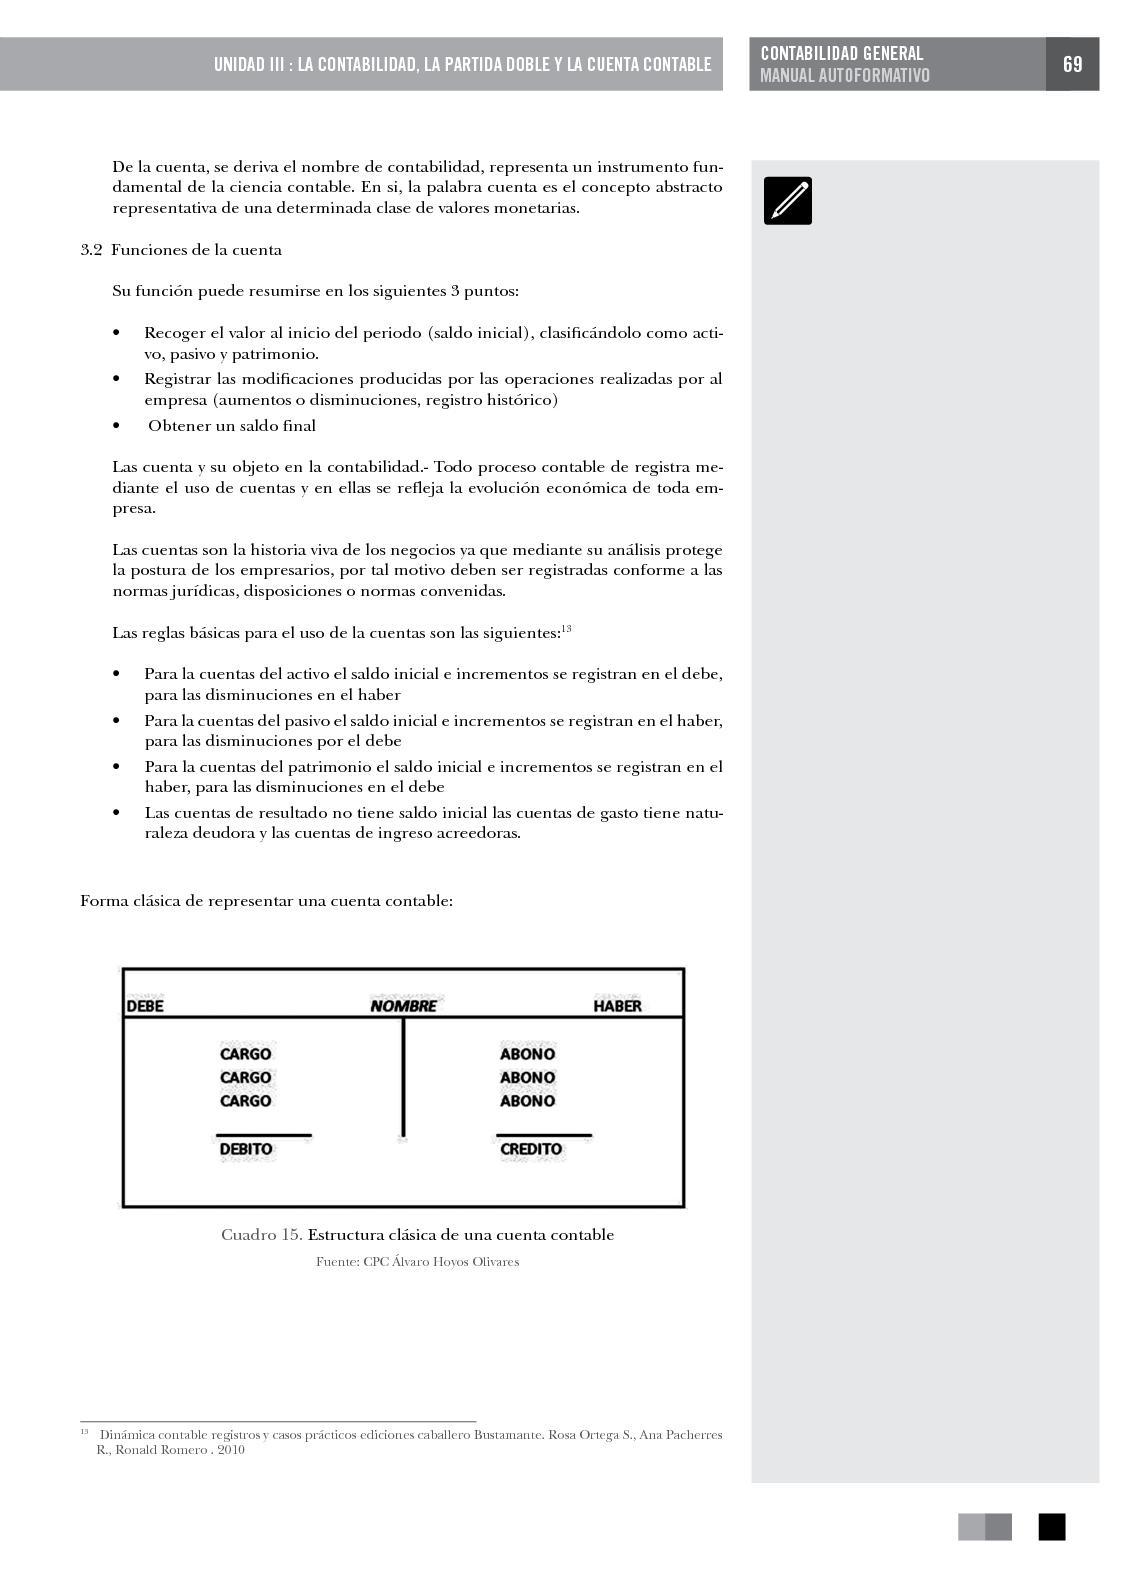 Contabilidad General Calameo Downloader